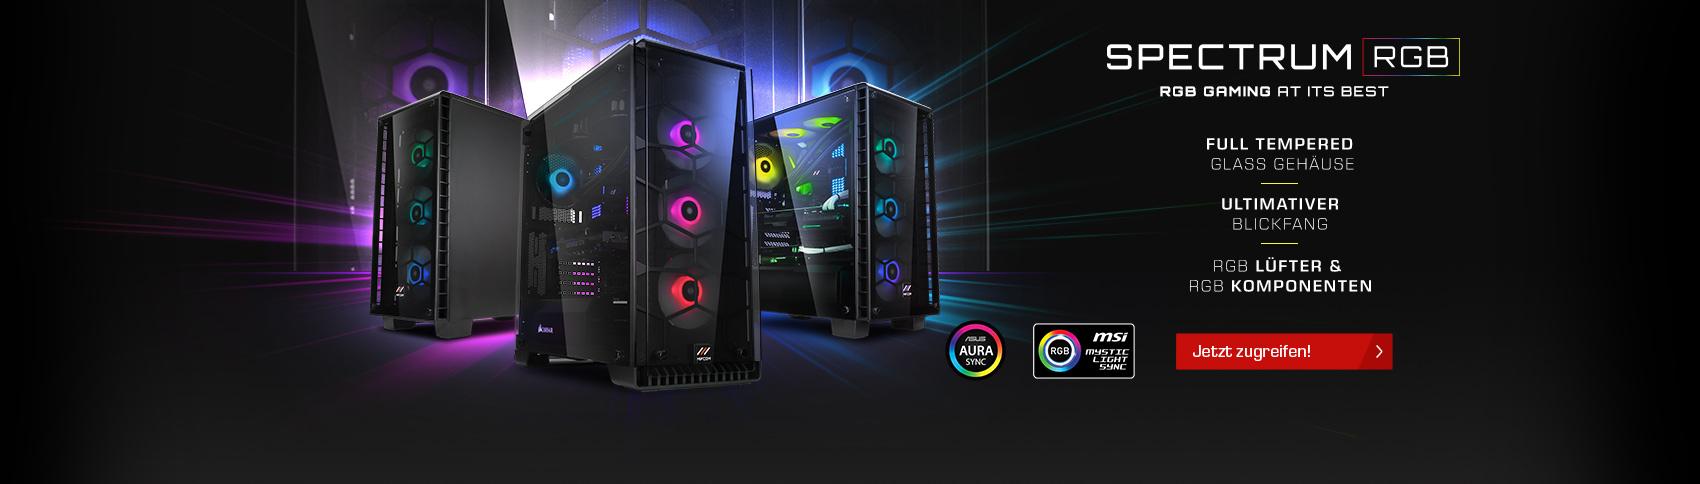 Spectrum RGB Series